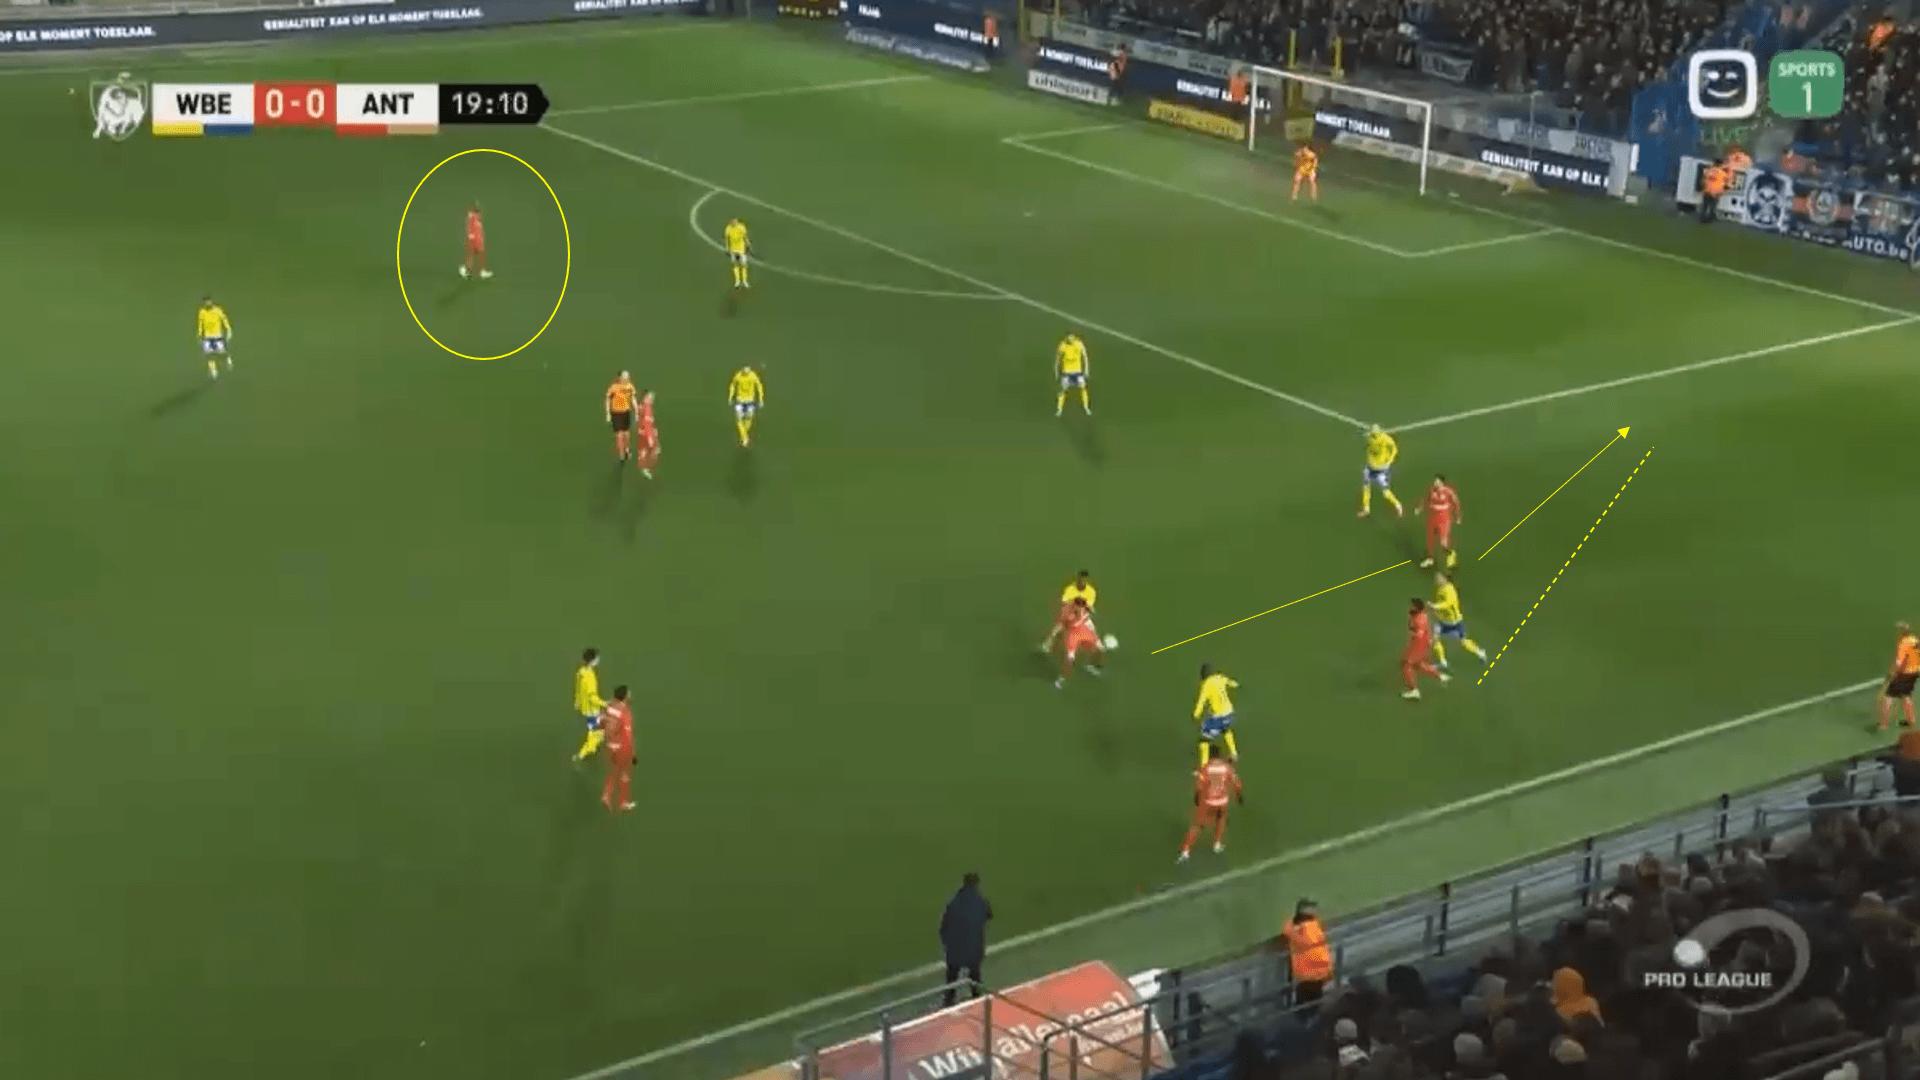 Didier Lamkel Zé 2019/20 - scout report - tactical analysis tactics